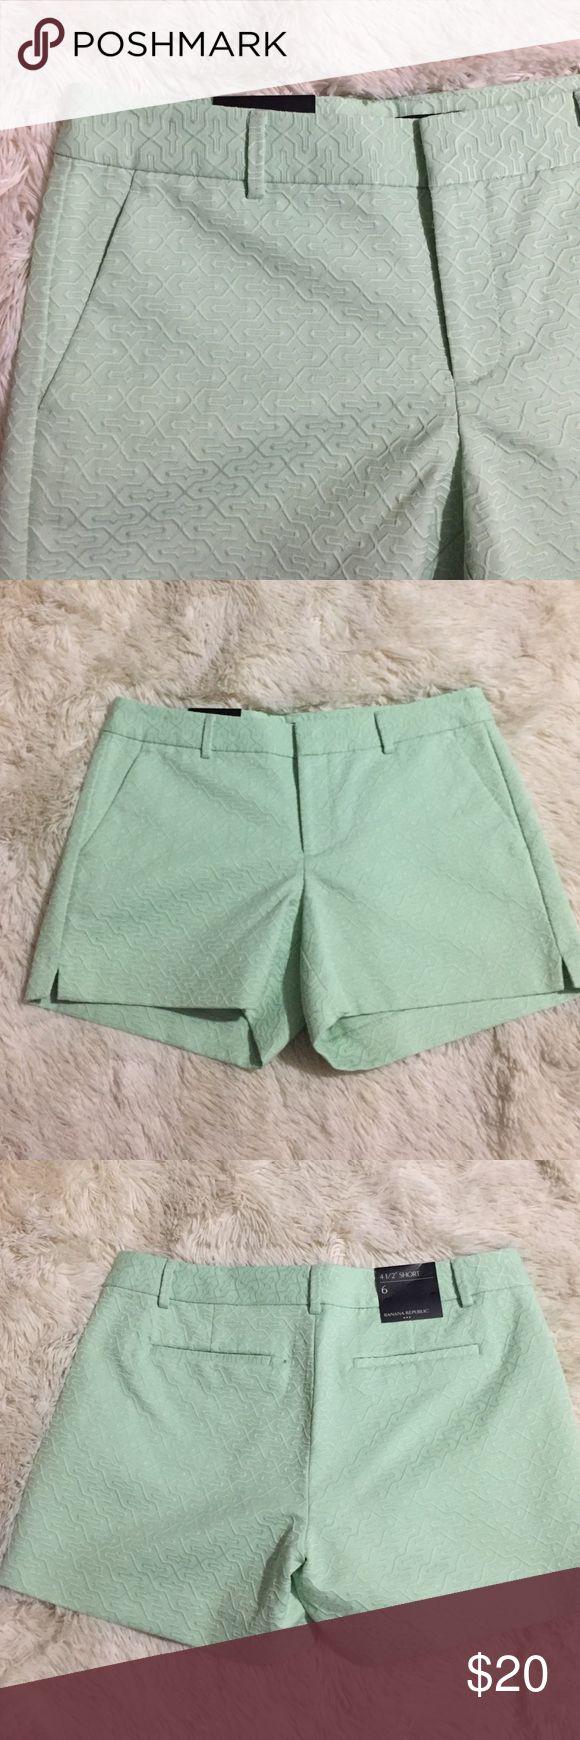 Banana Republic- Green Geometric Short Banana Republic- Green Geometric pattern Shorts. Length of shorts are 4.5 inches. Banana Republic Shorts